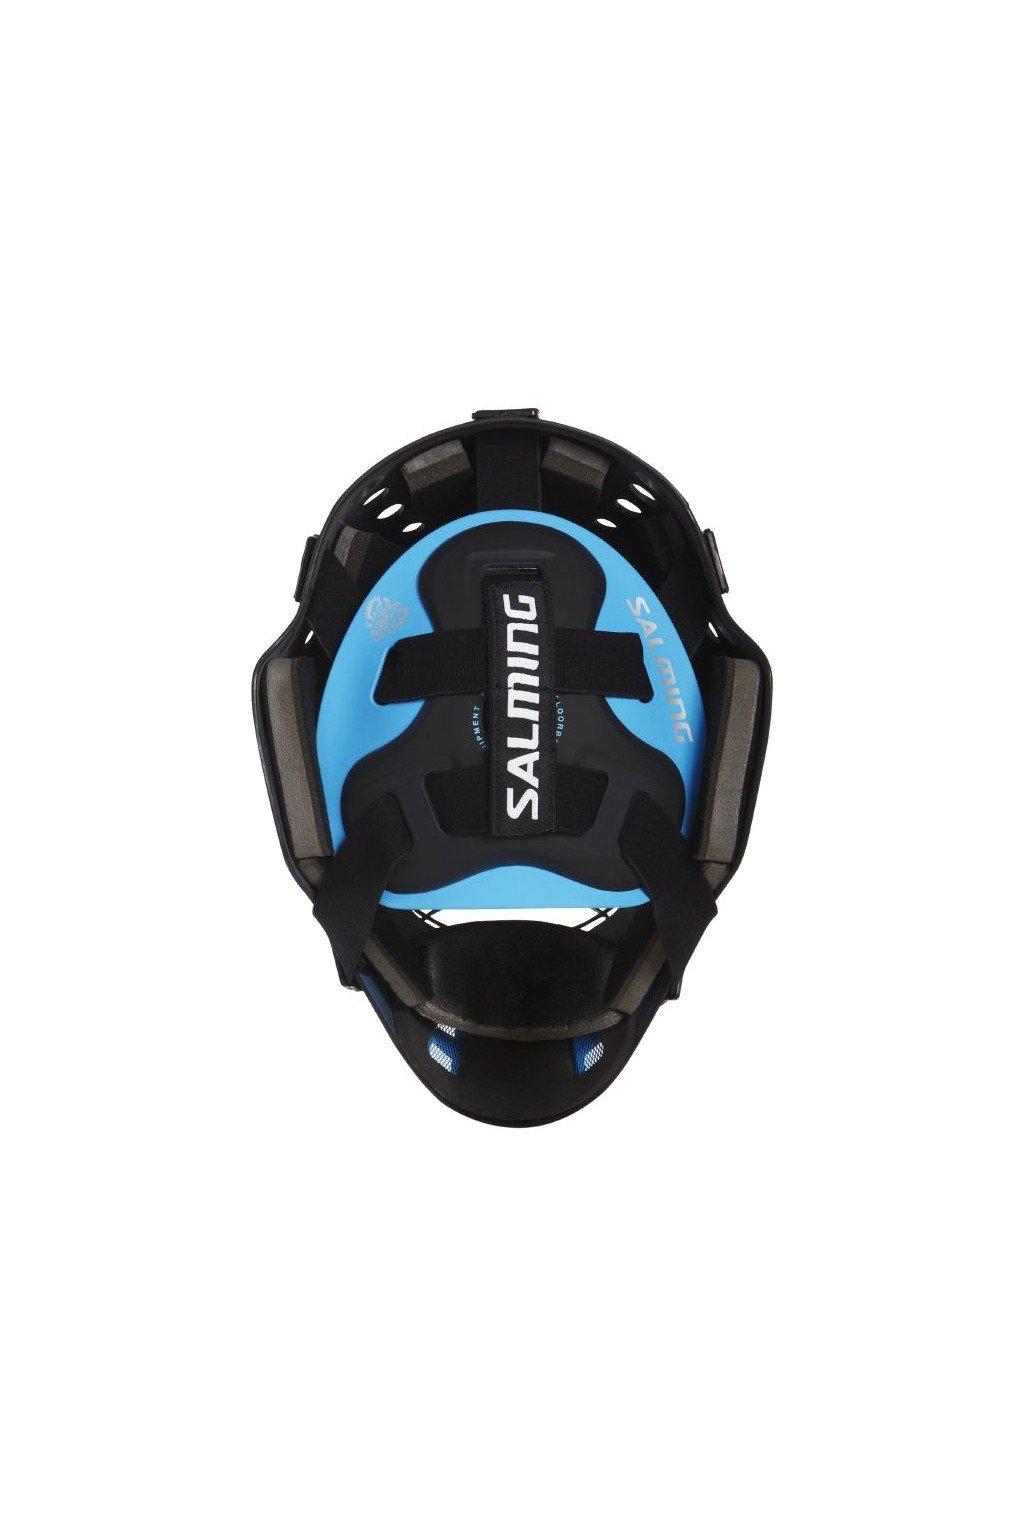 salming elite helmet strapsbuckles black